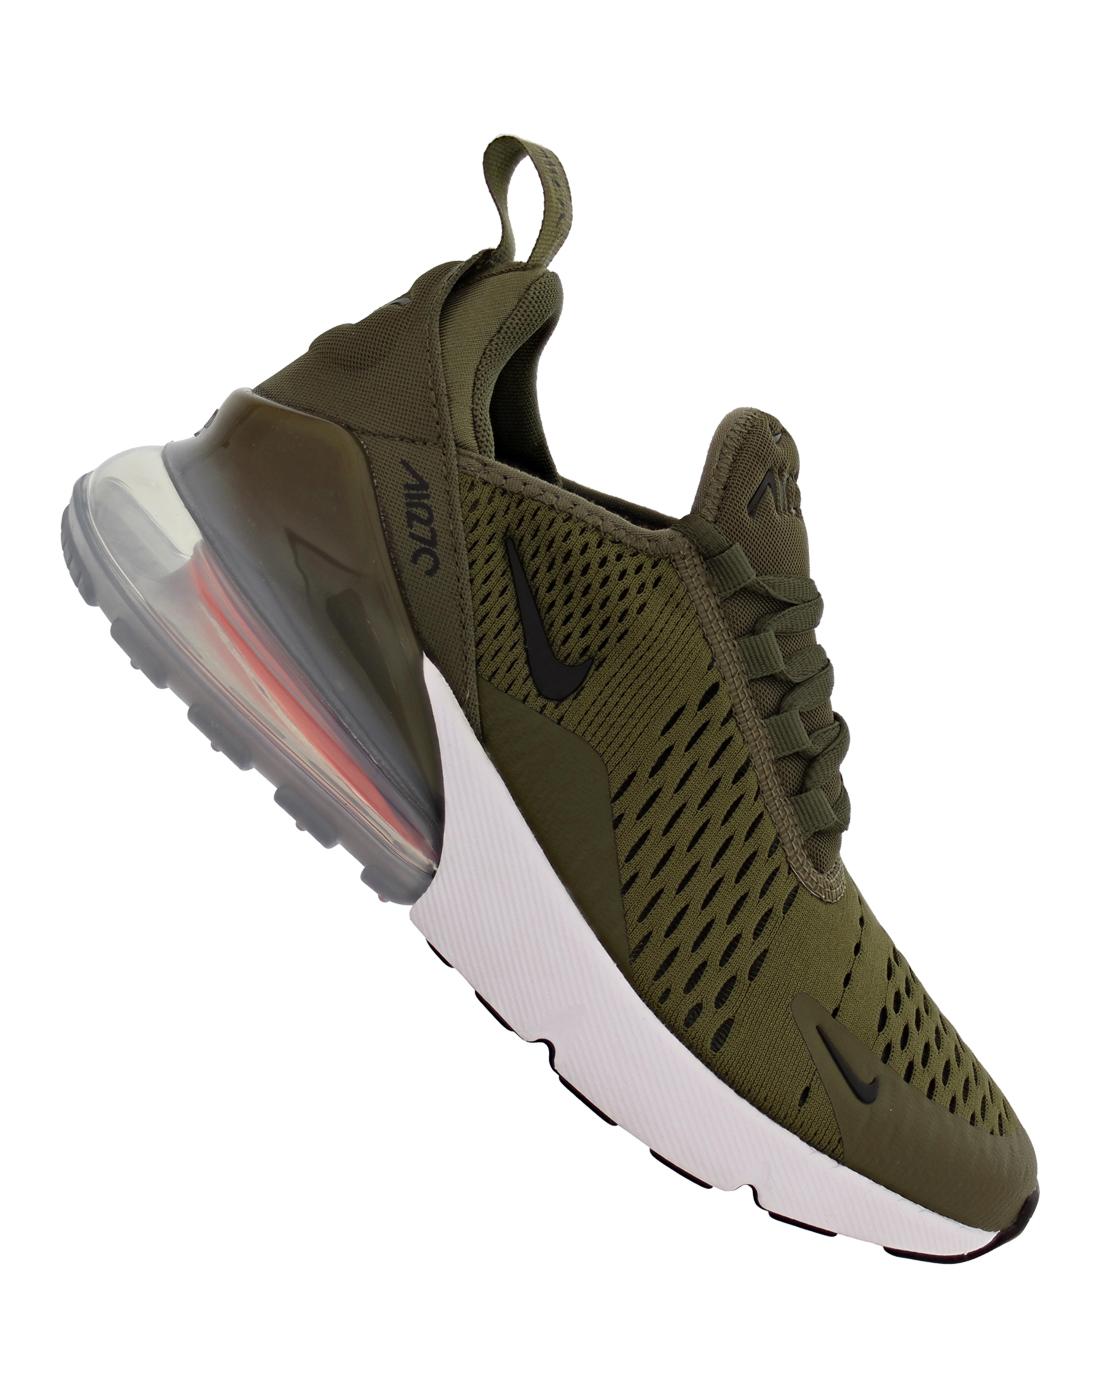 a571ccaea3c Kids Nike Air Max 270 Trainers